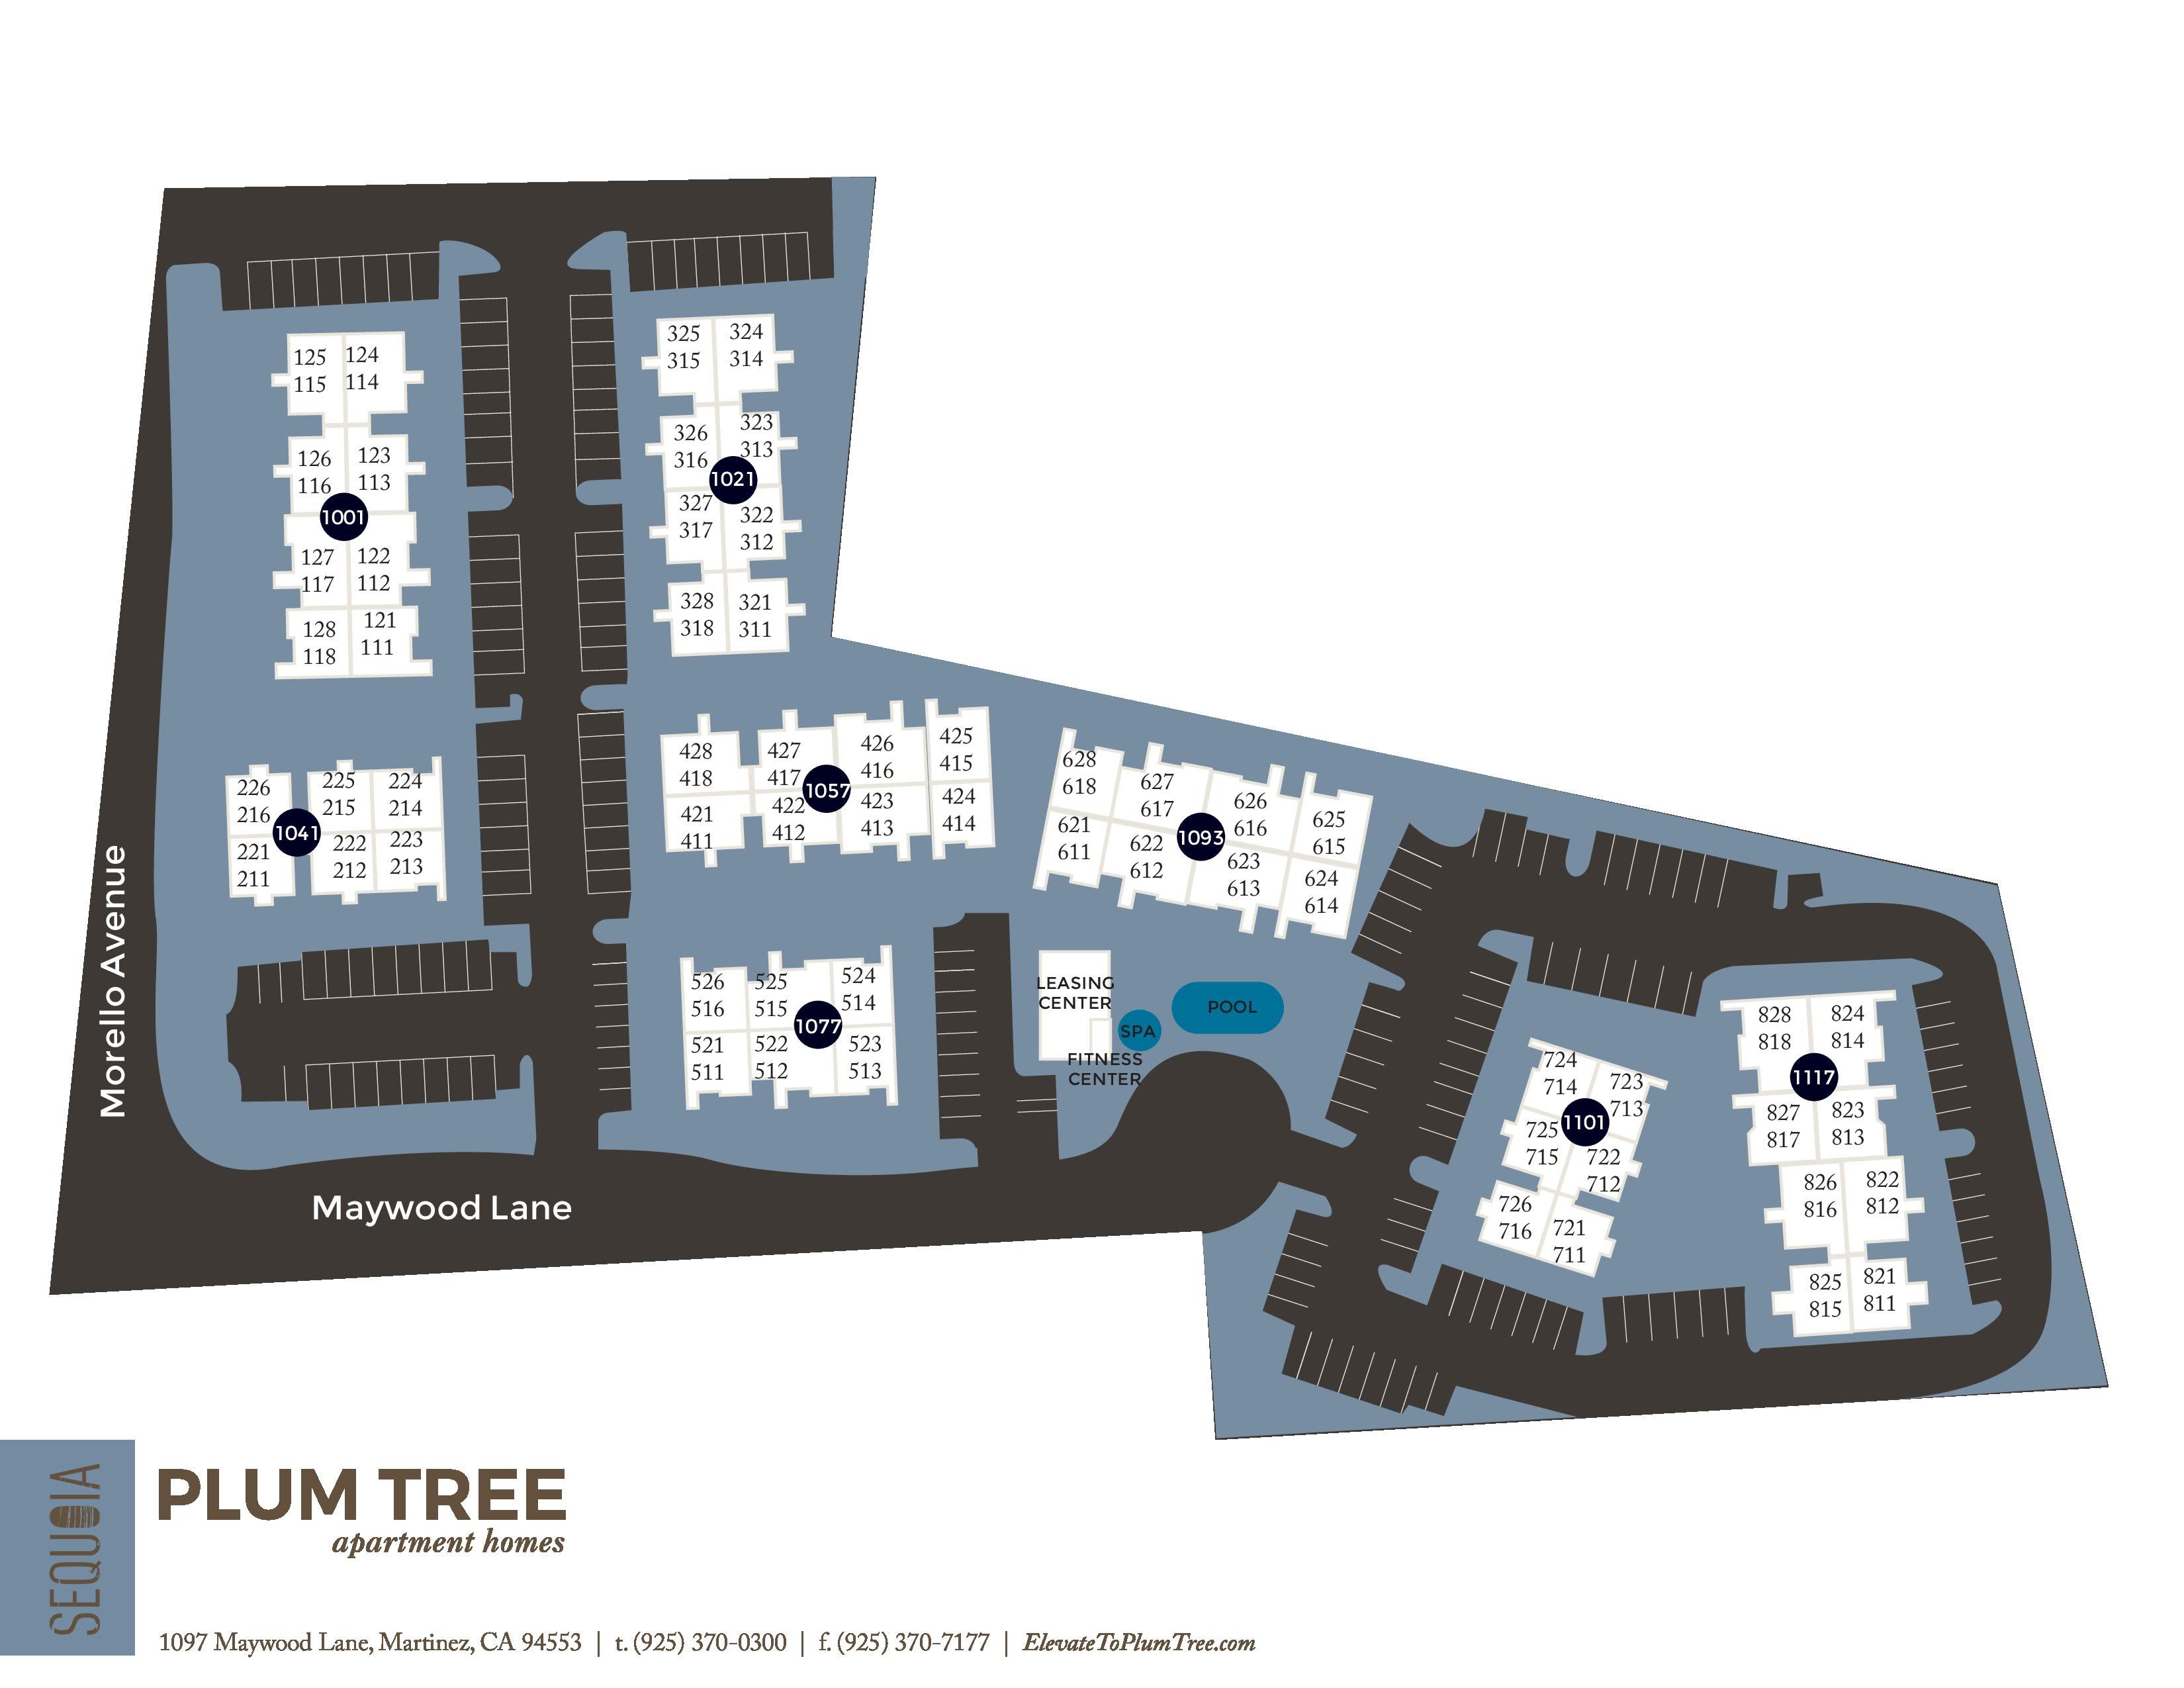 Community site map for Plum Tree Apartment Homes in Martinez, California